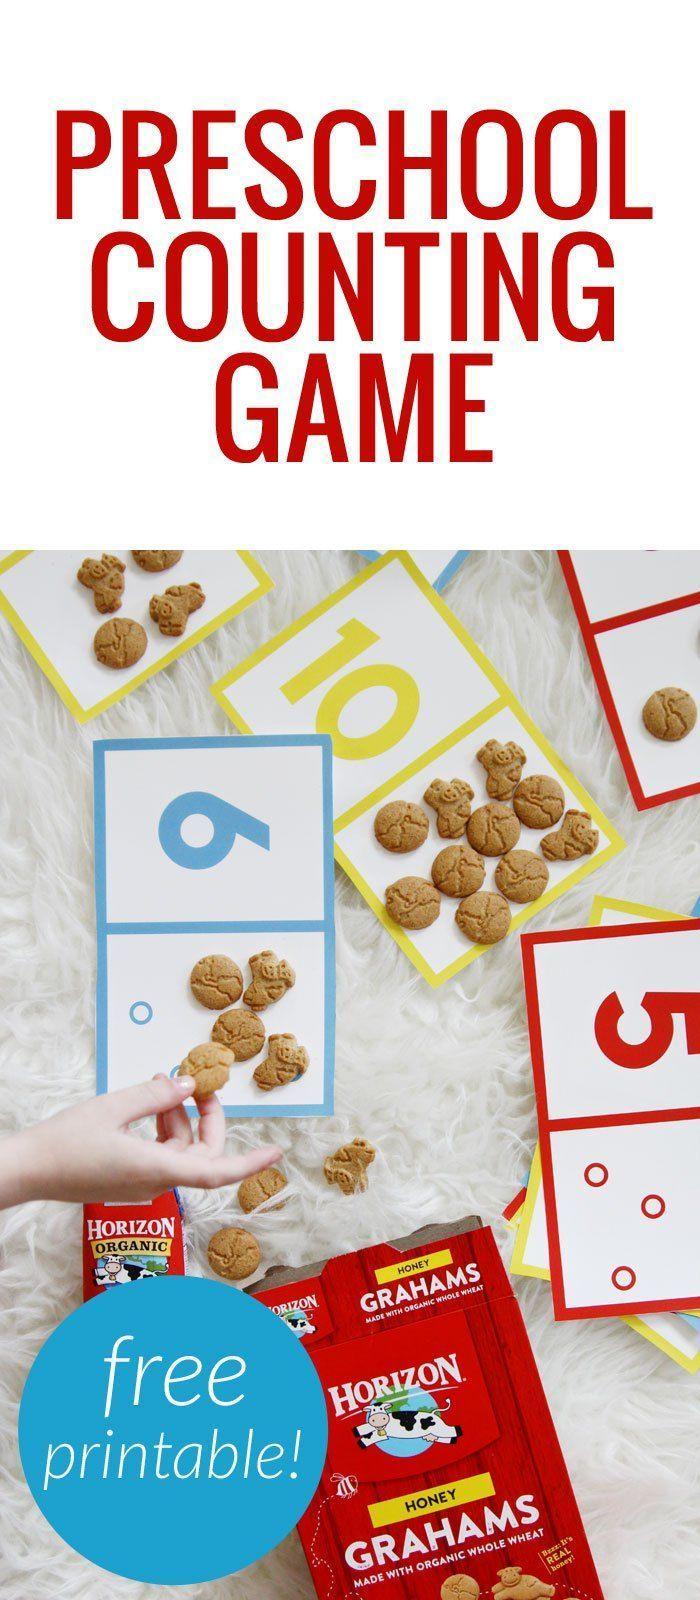 Preschool Math Counting Game + Free Printable